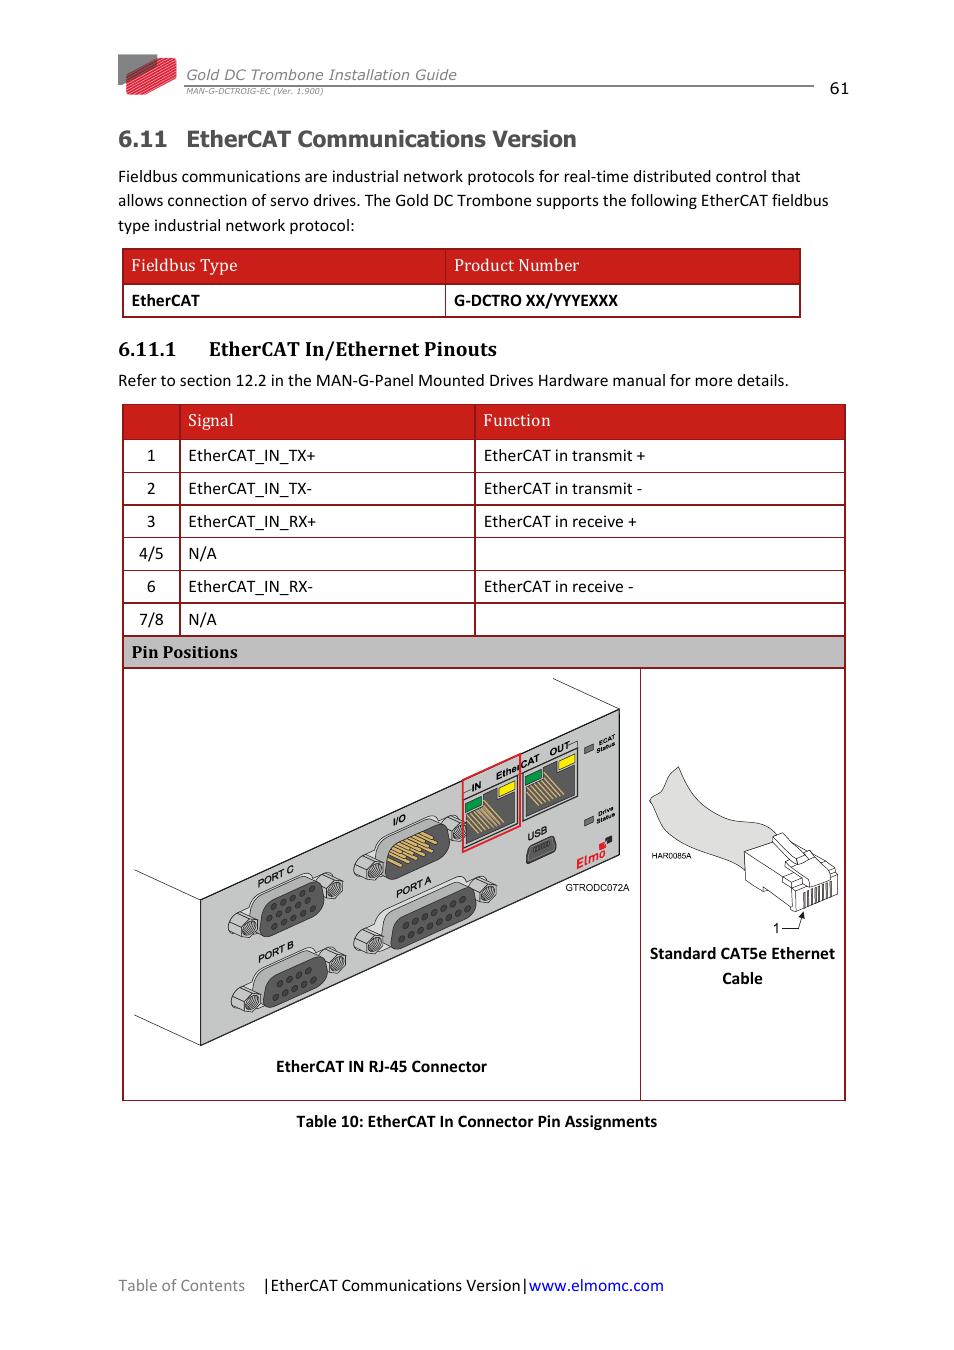 elmomc gold line digital servo drives gold dc trombone page61 11 ethercat communications version, 1 ethercat in ethernet pinouts